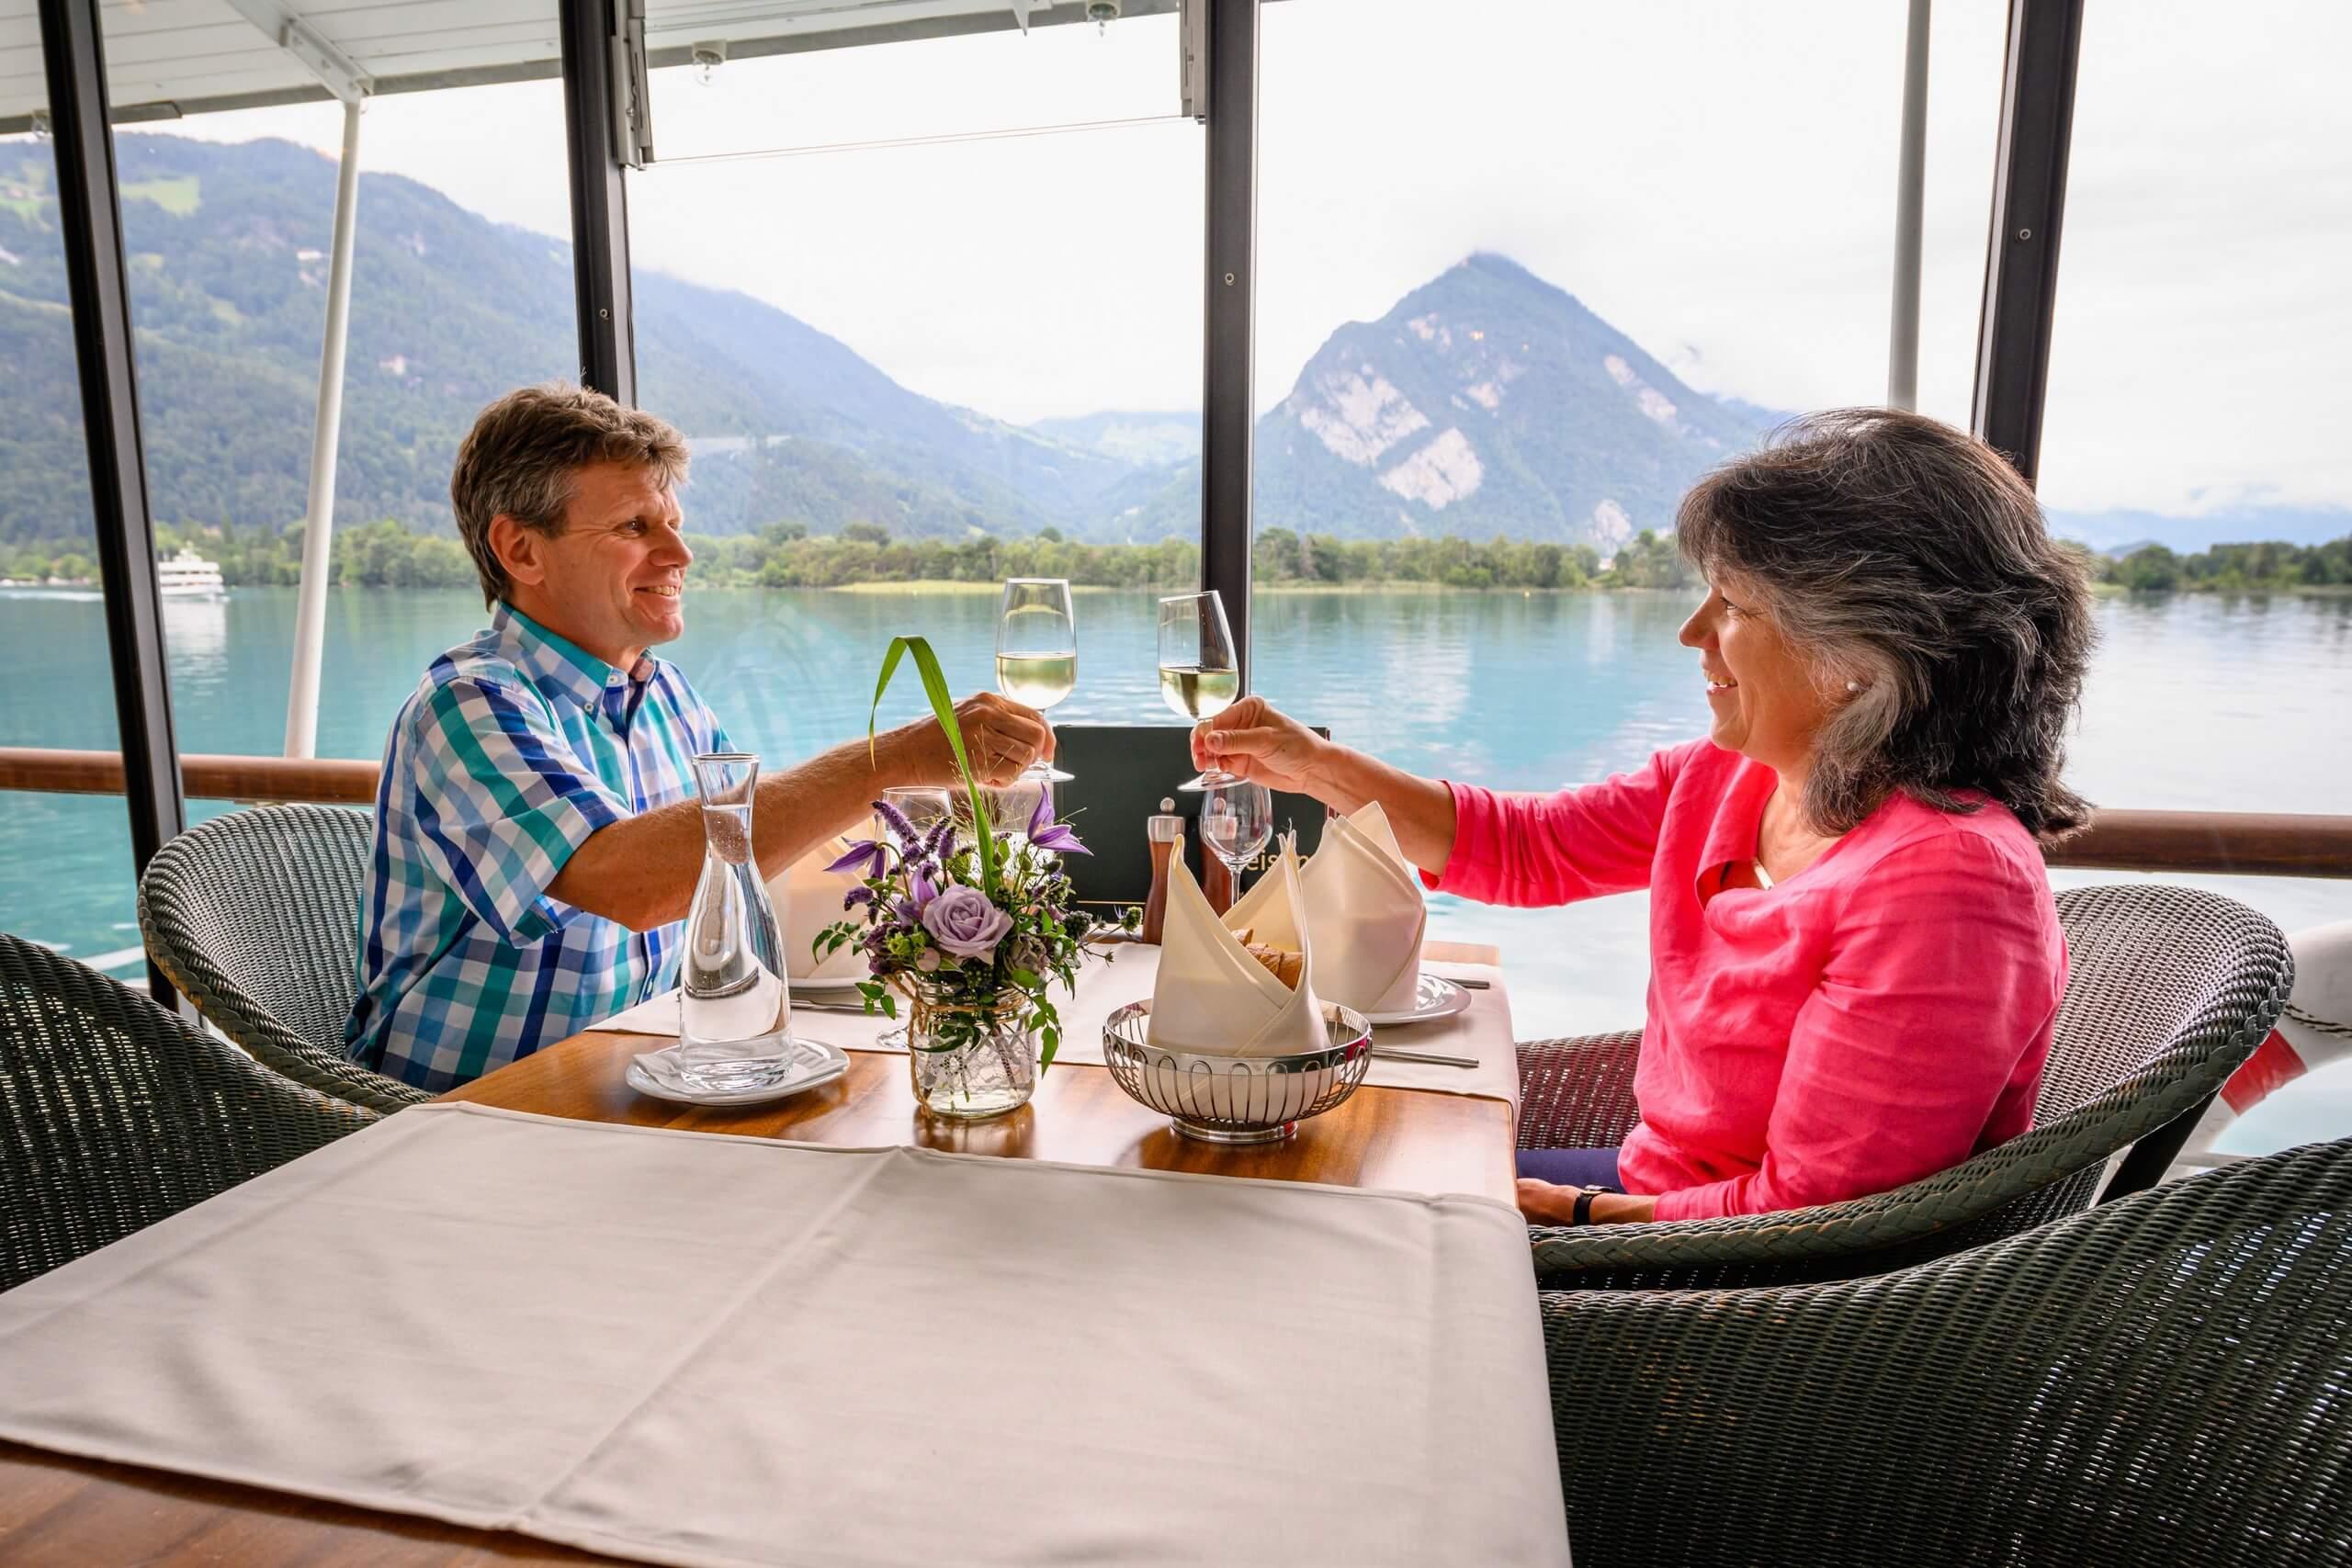 bls-schifffahrt-kulinarik-lunch-romantik-paar-fruehlings-aktion